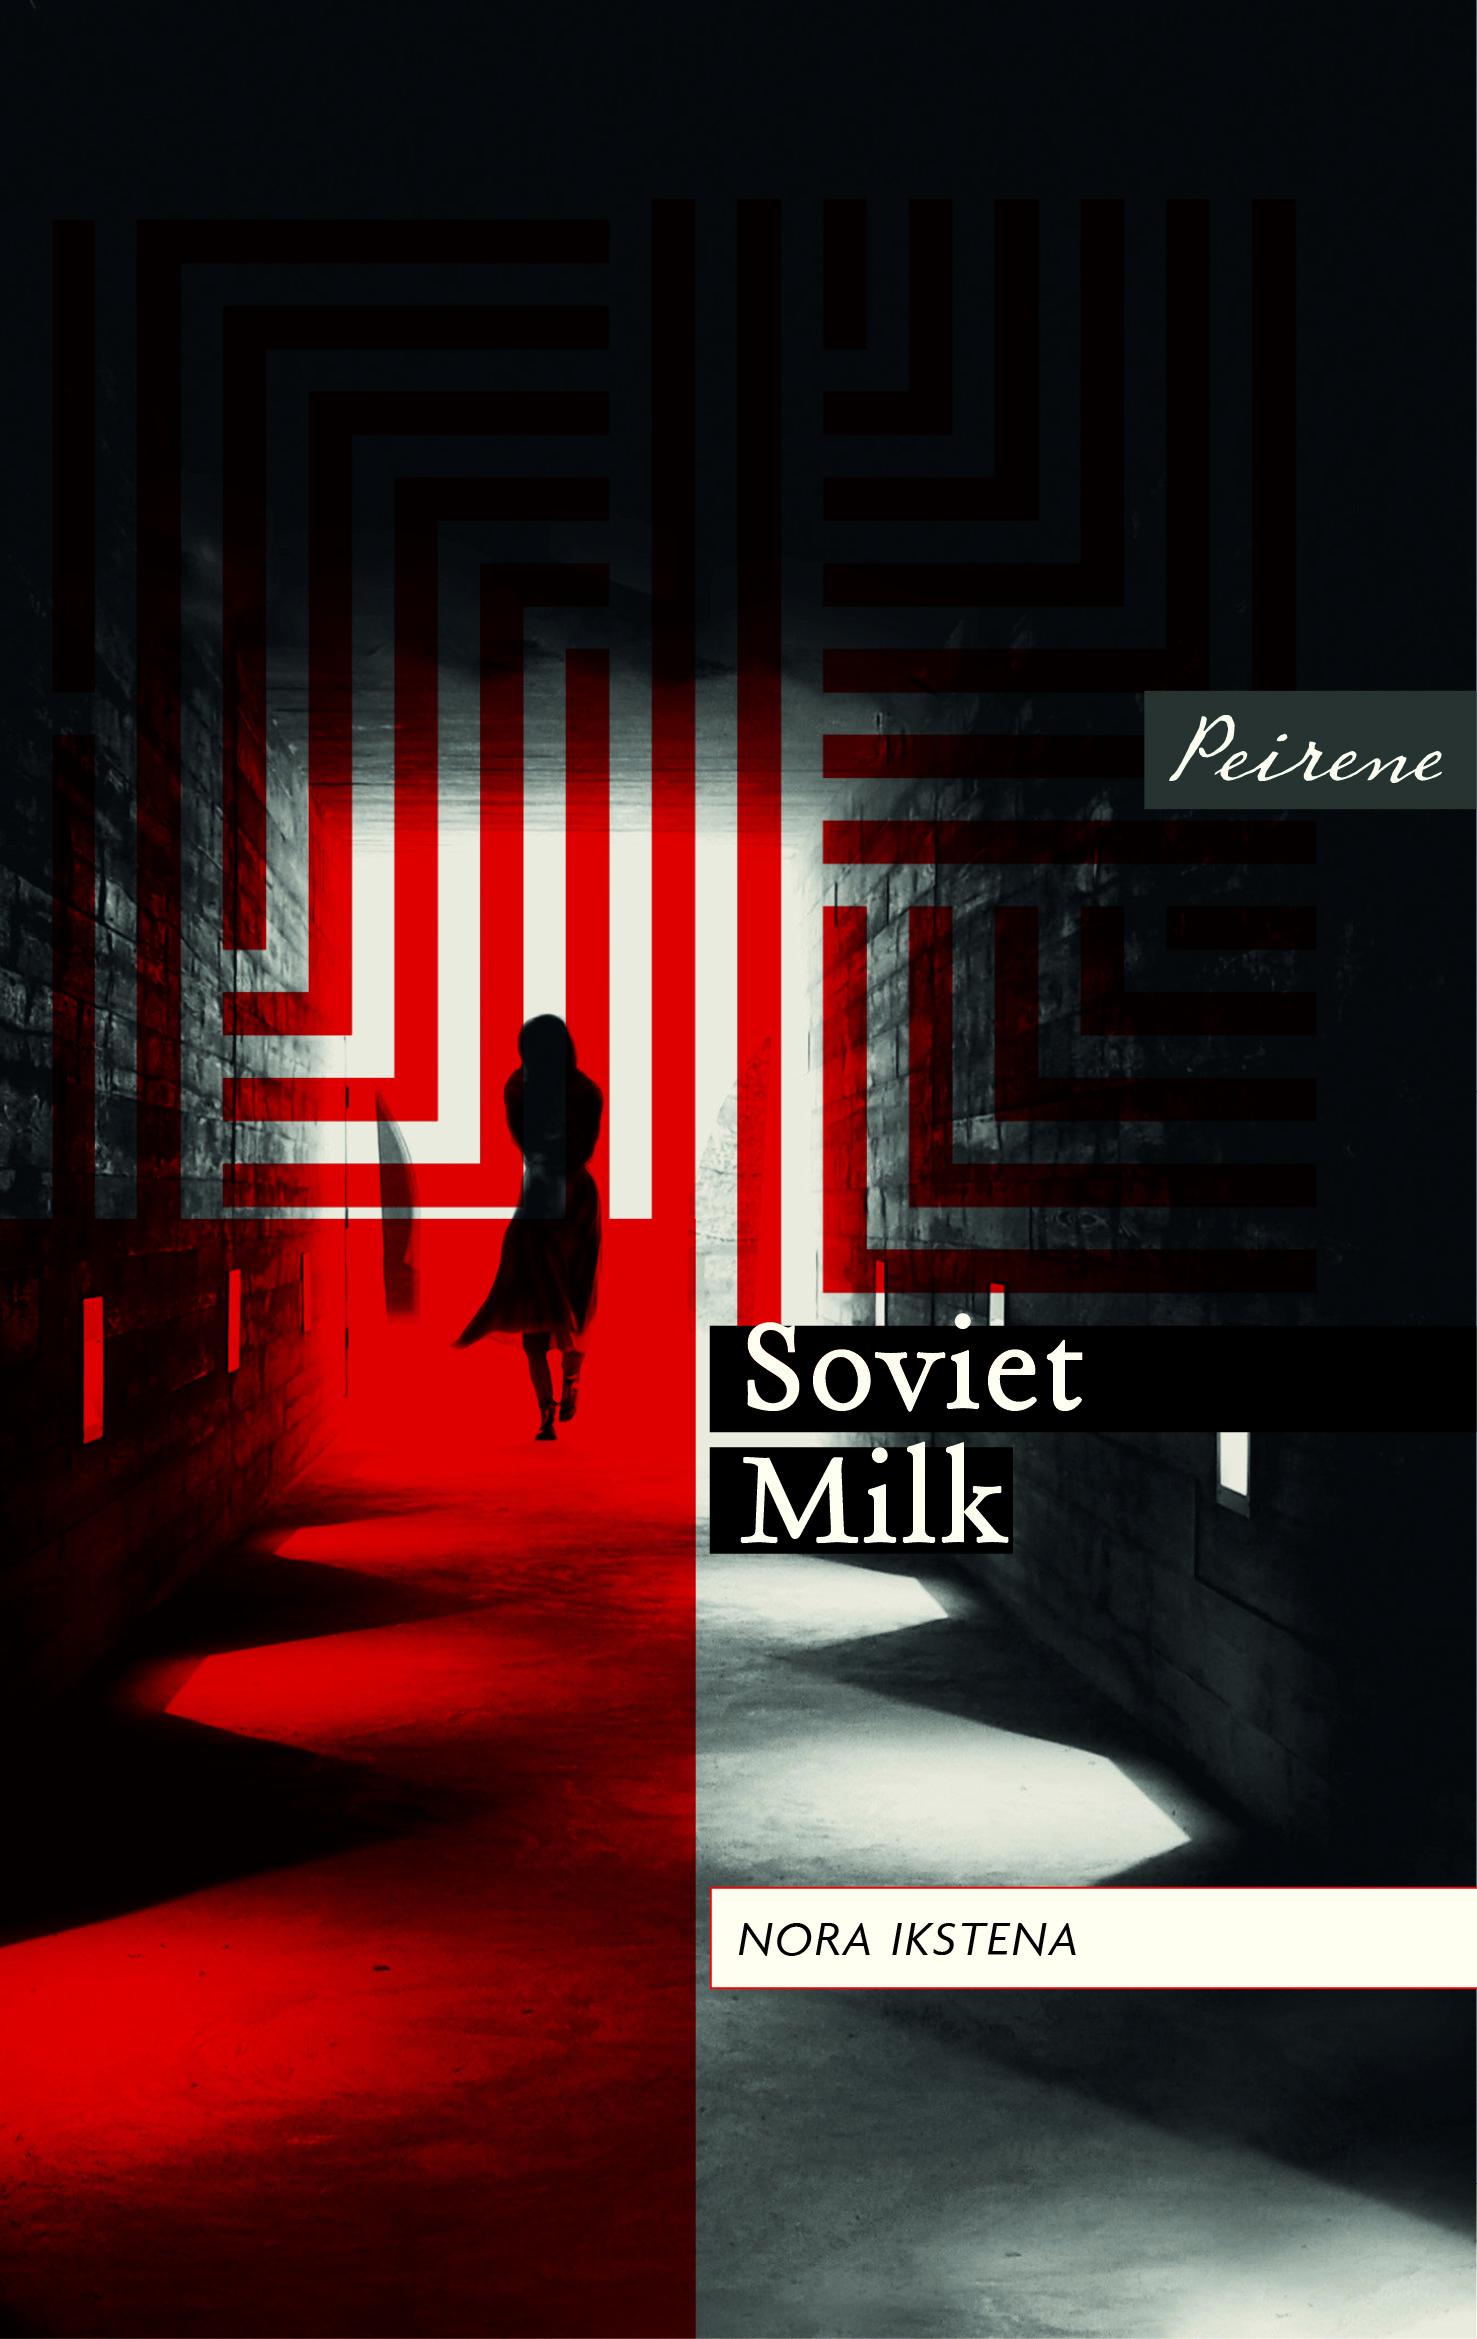 Soviet Milk jacket image.jpg